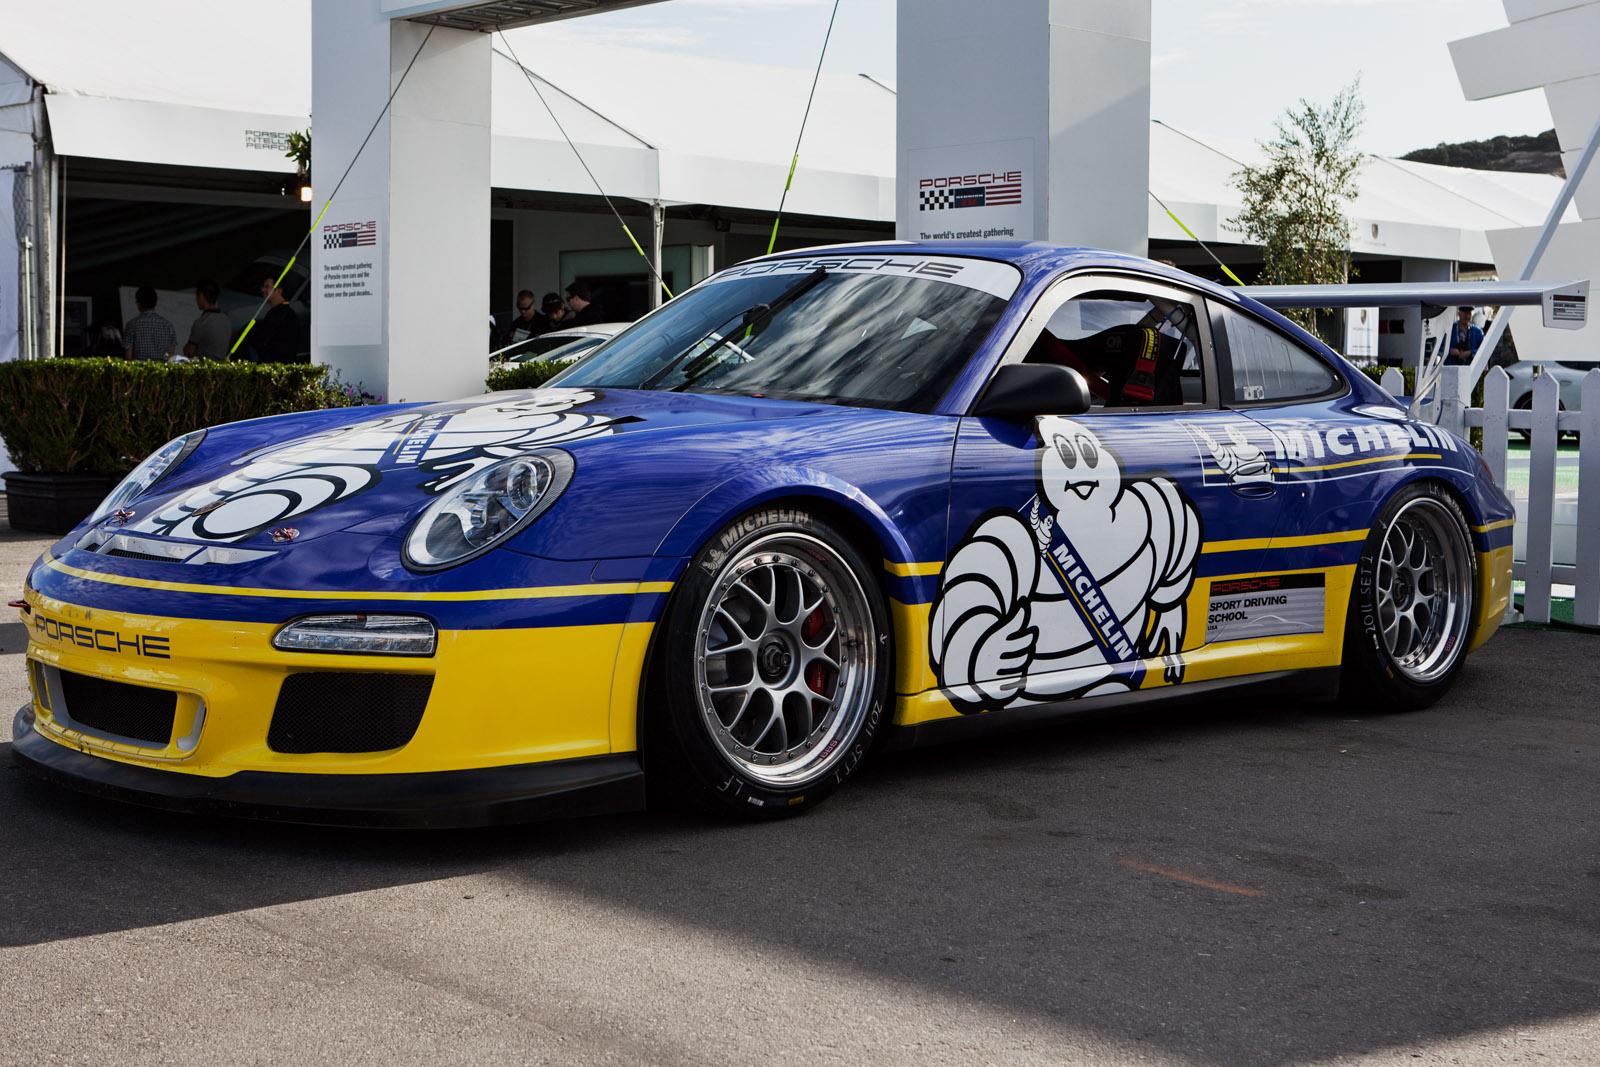 File Michelin Porsche 997 Gt3 Cup Porsche Rennsport